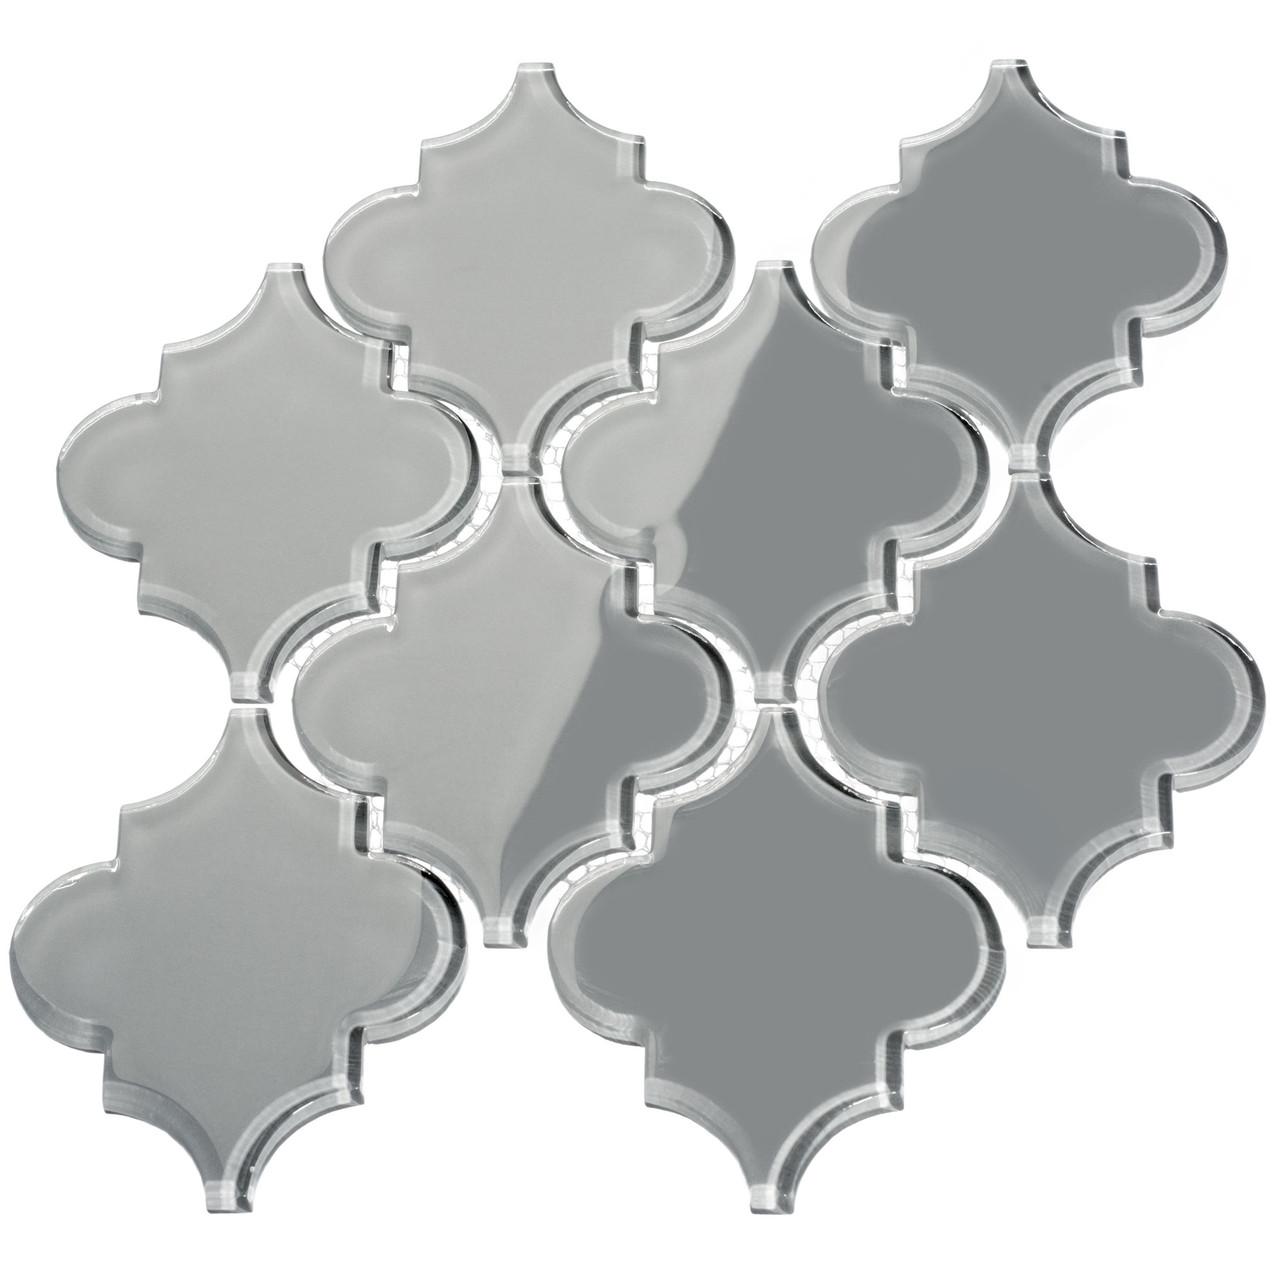 giorbello glass arabesque tile true gray